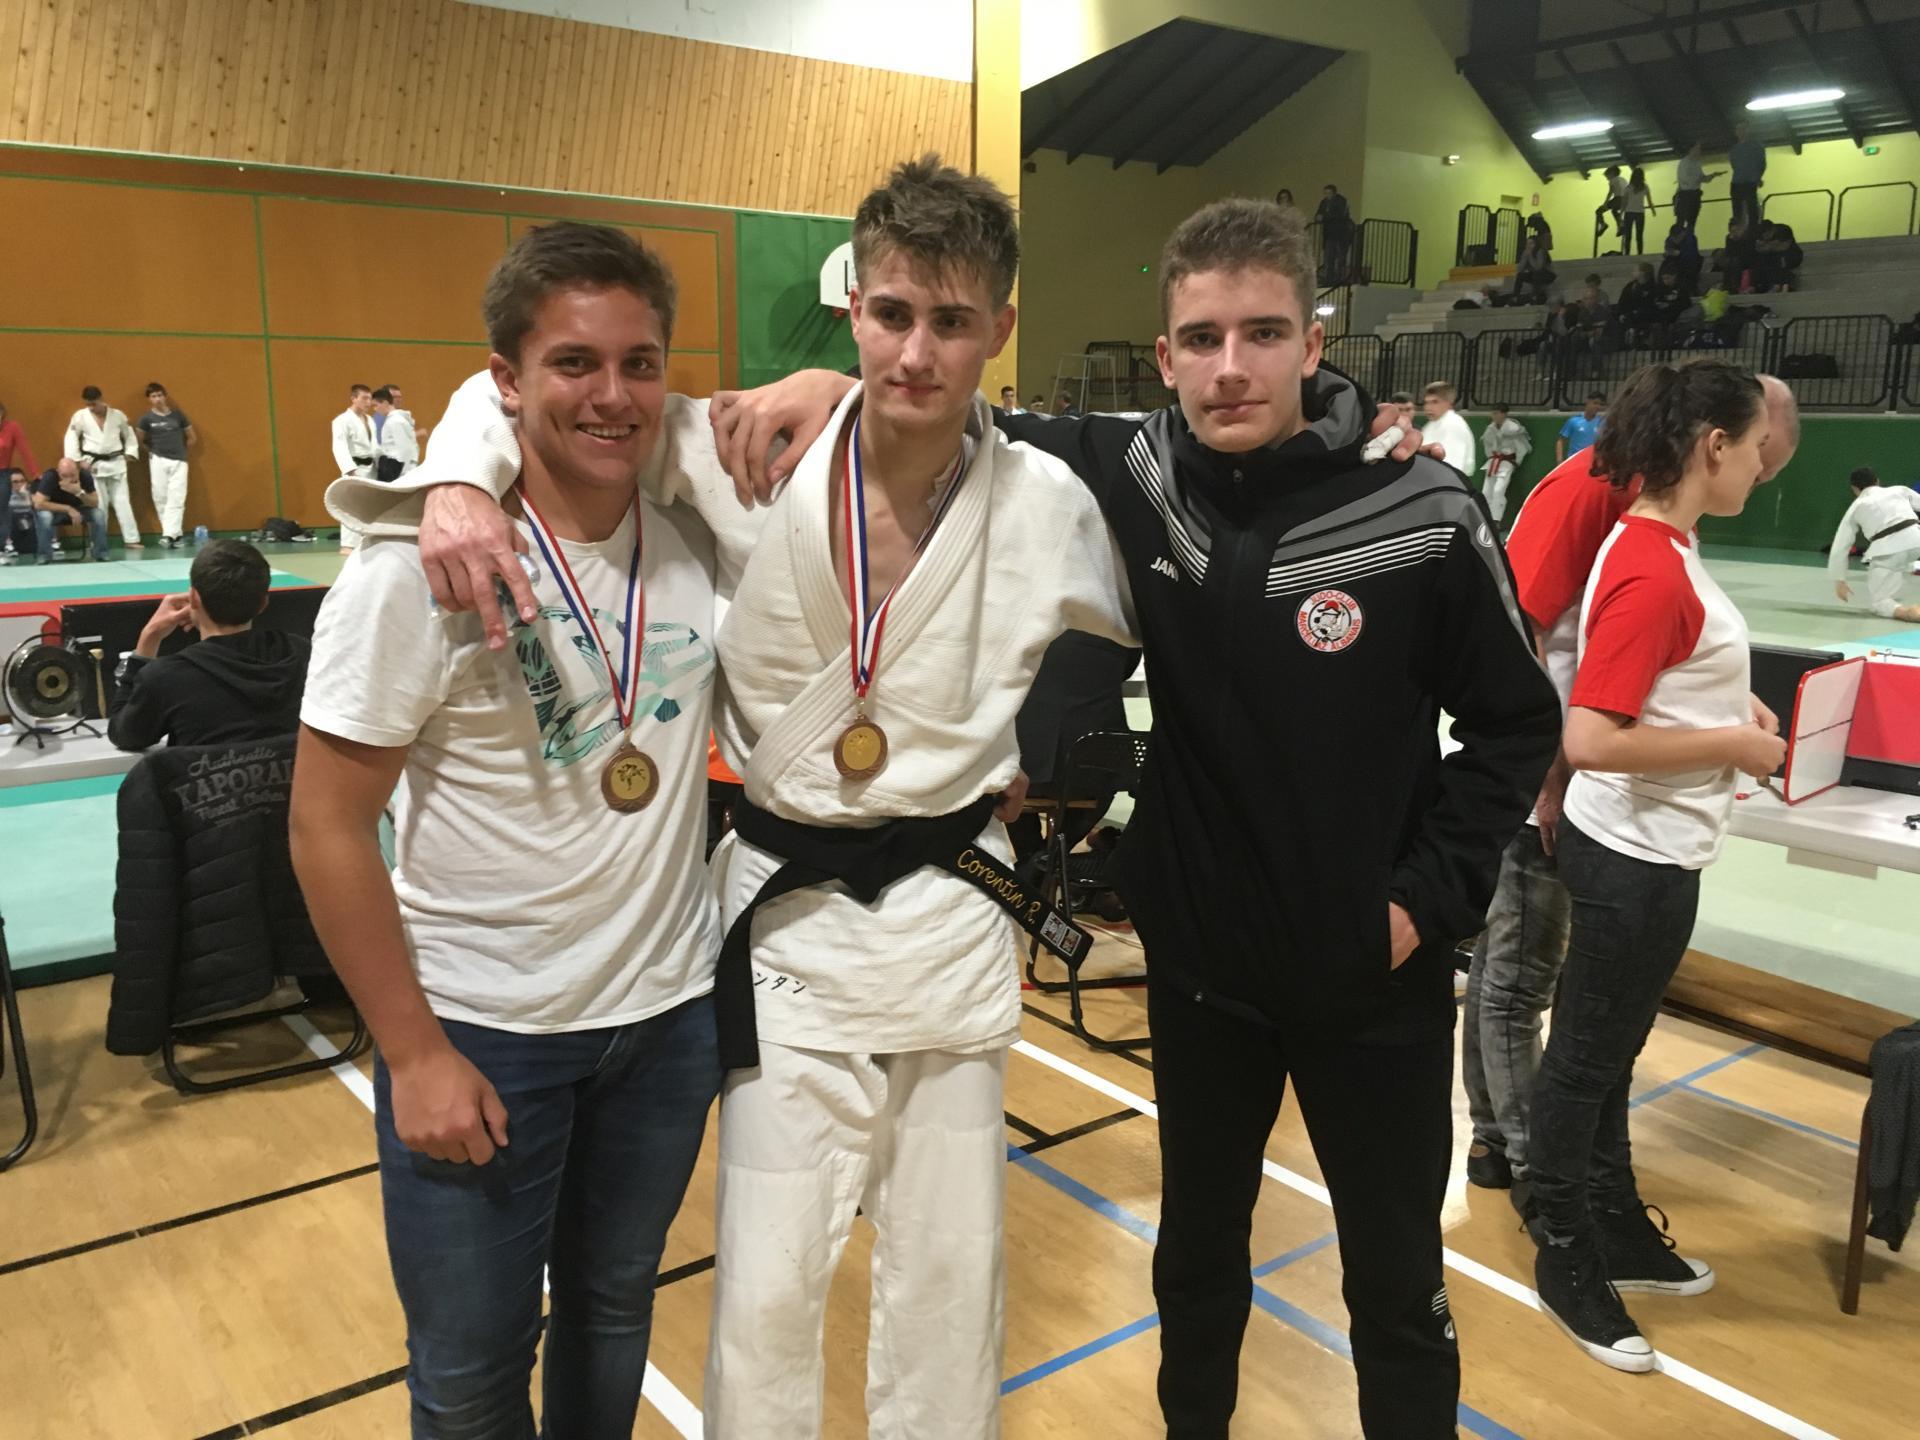 Tournoi cadets Drome-Ardèche 2017